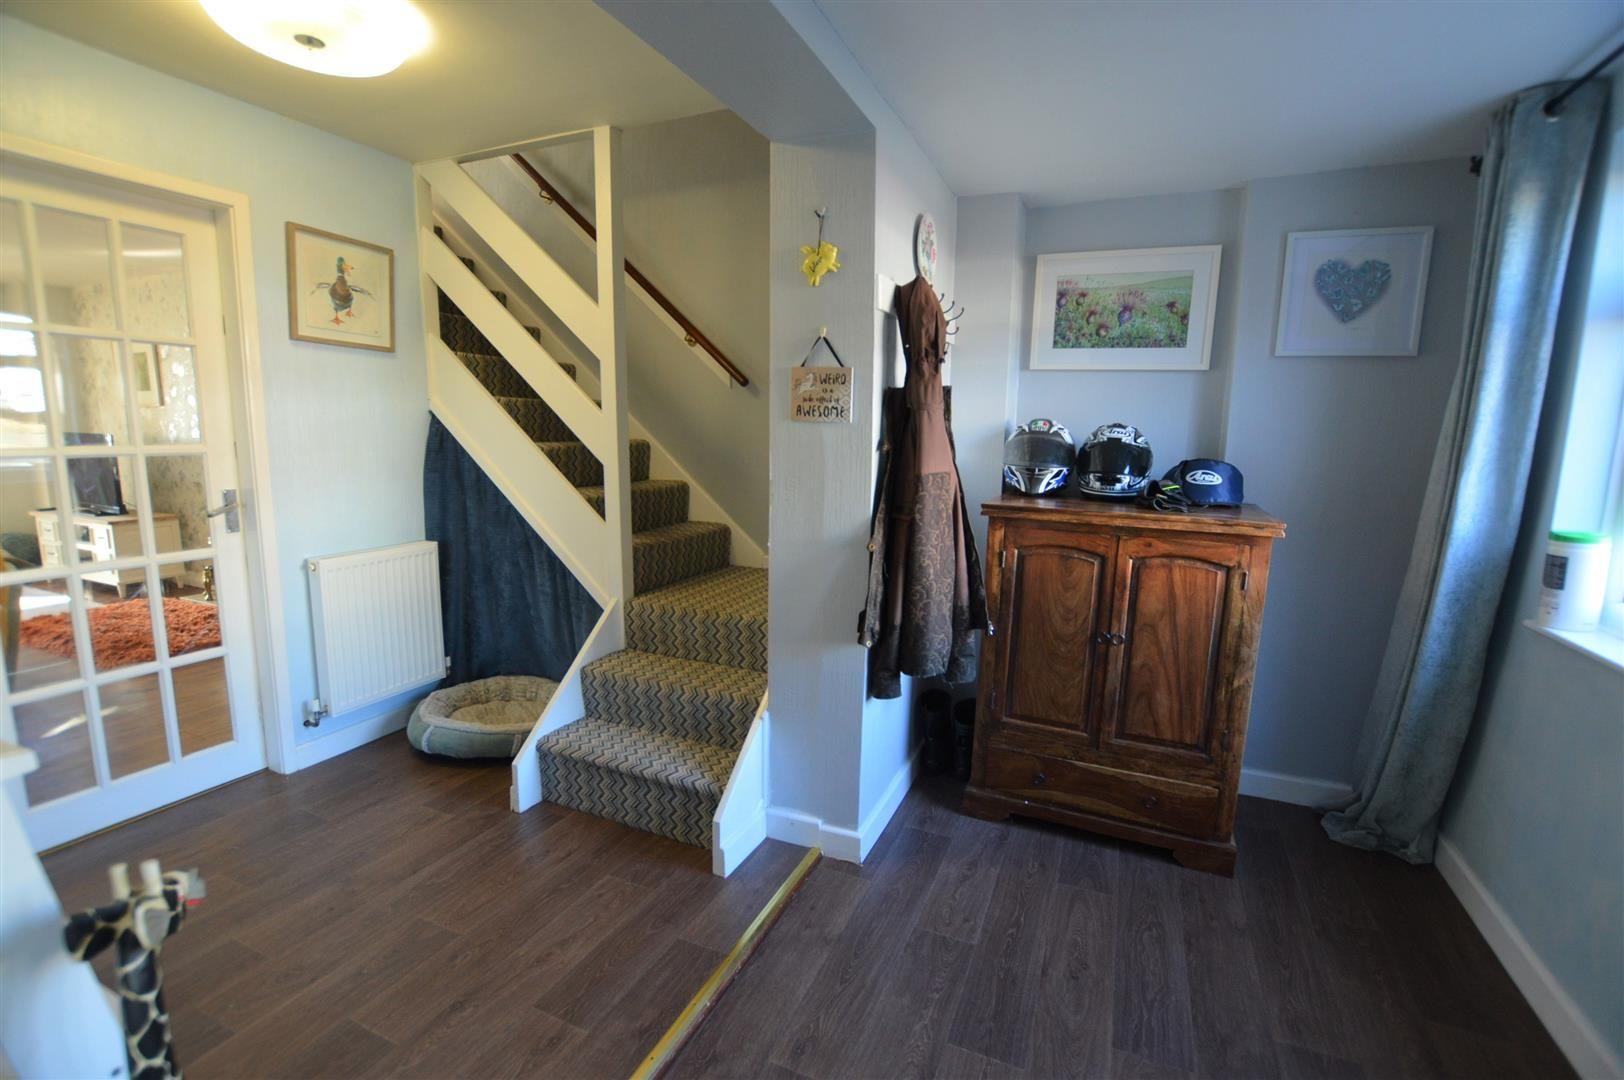 4 bed semi-detached for sale in Bromyard 5